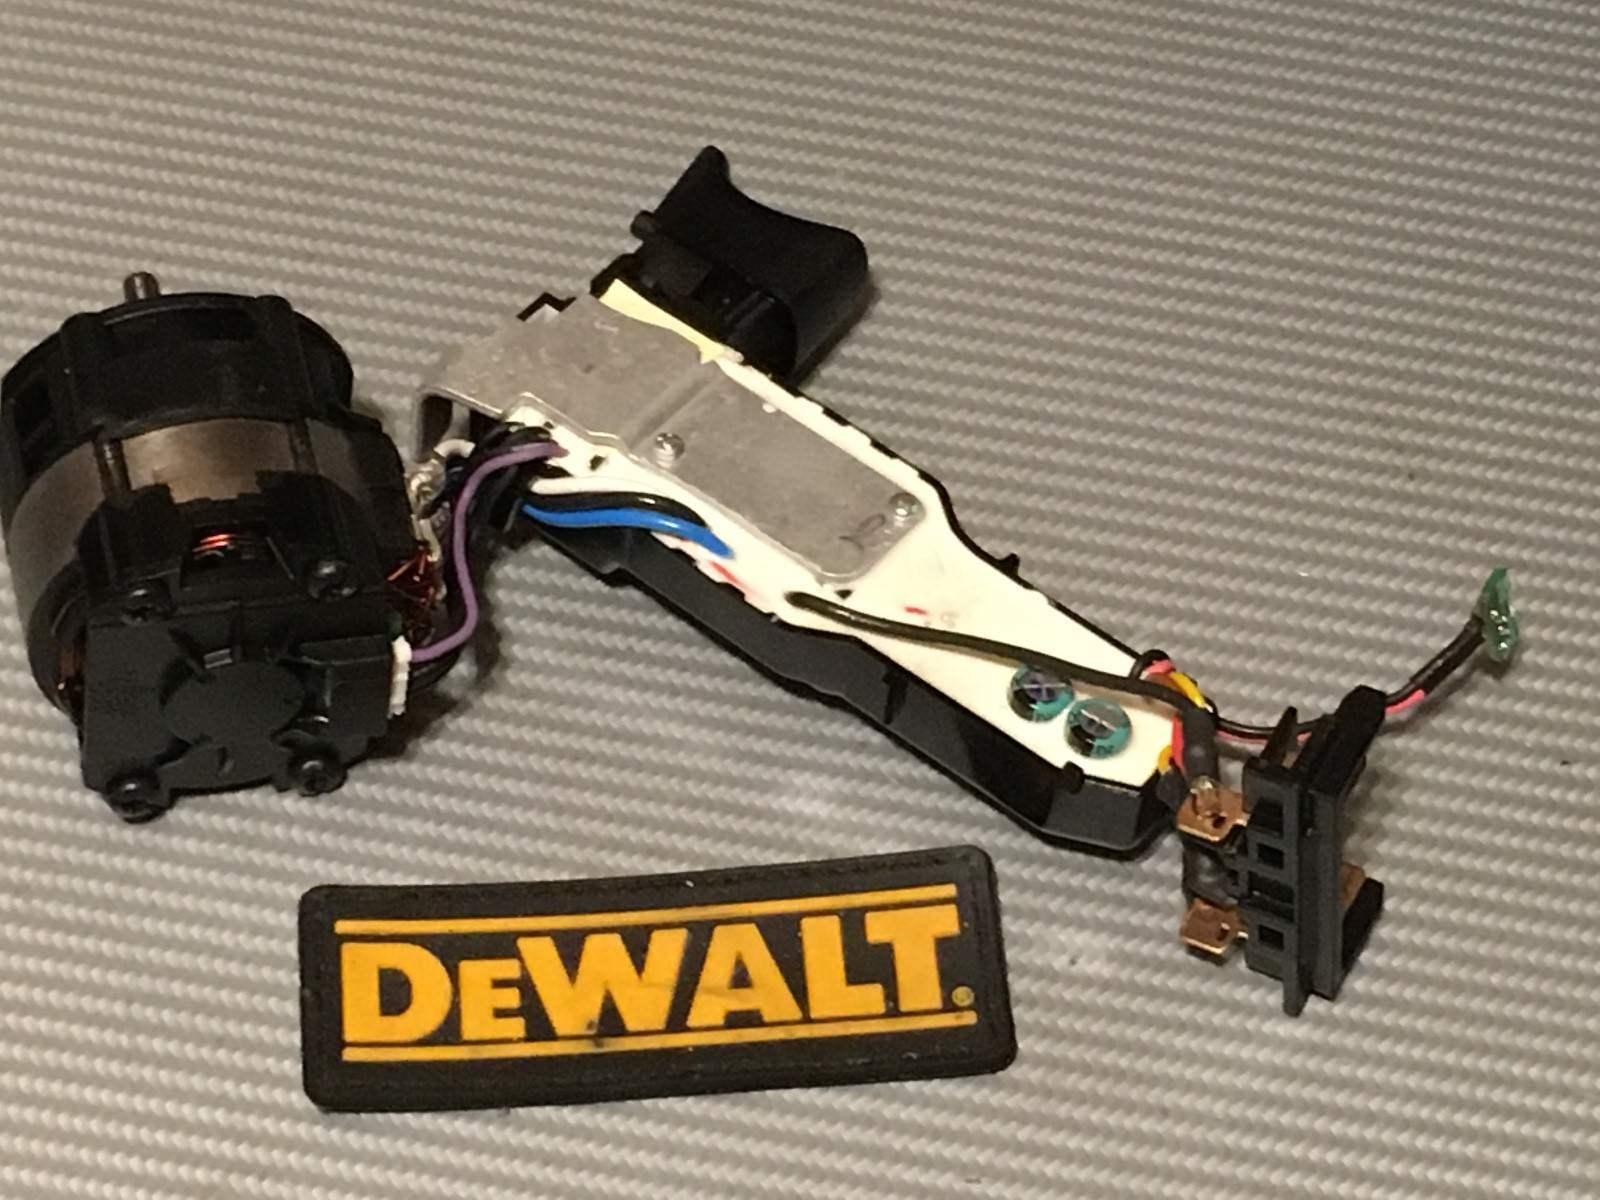 Dewalt XR 20V DCD790, DCD795 Bürstenloser Motor / Schalter Baugruppe, N434174